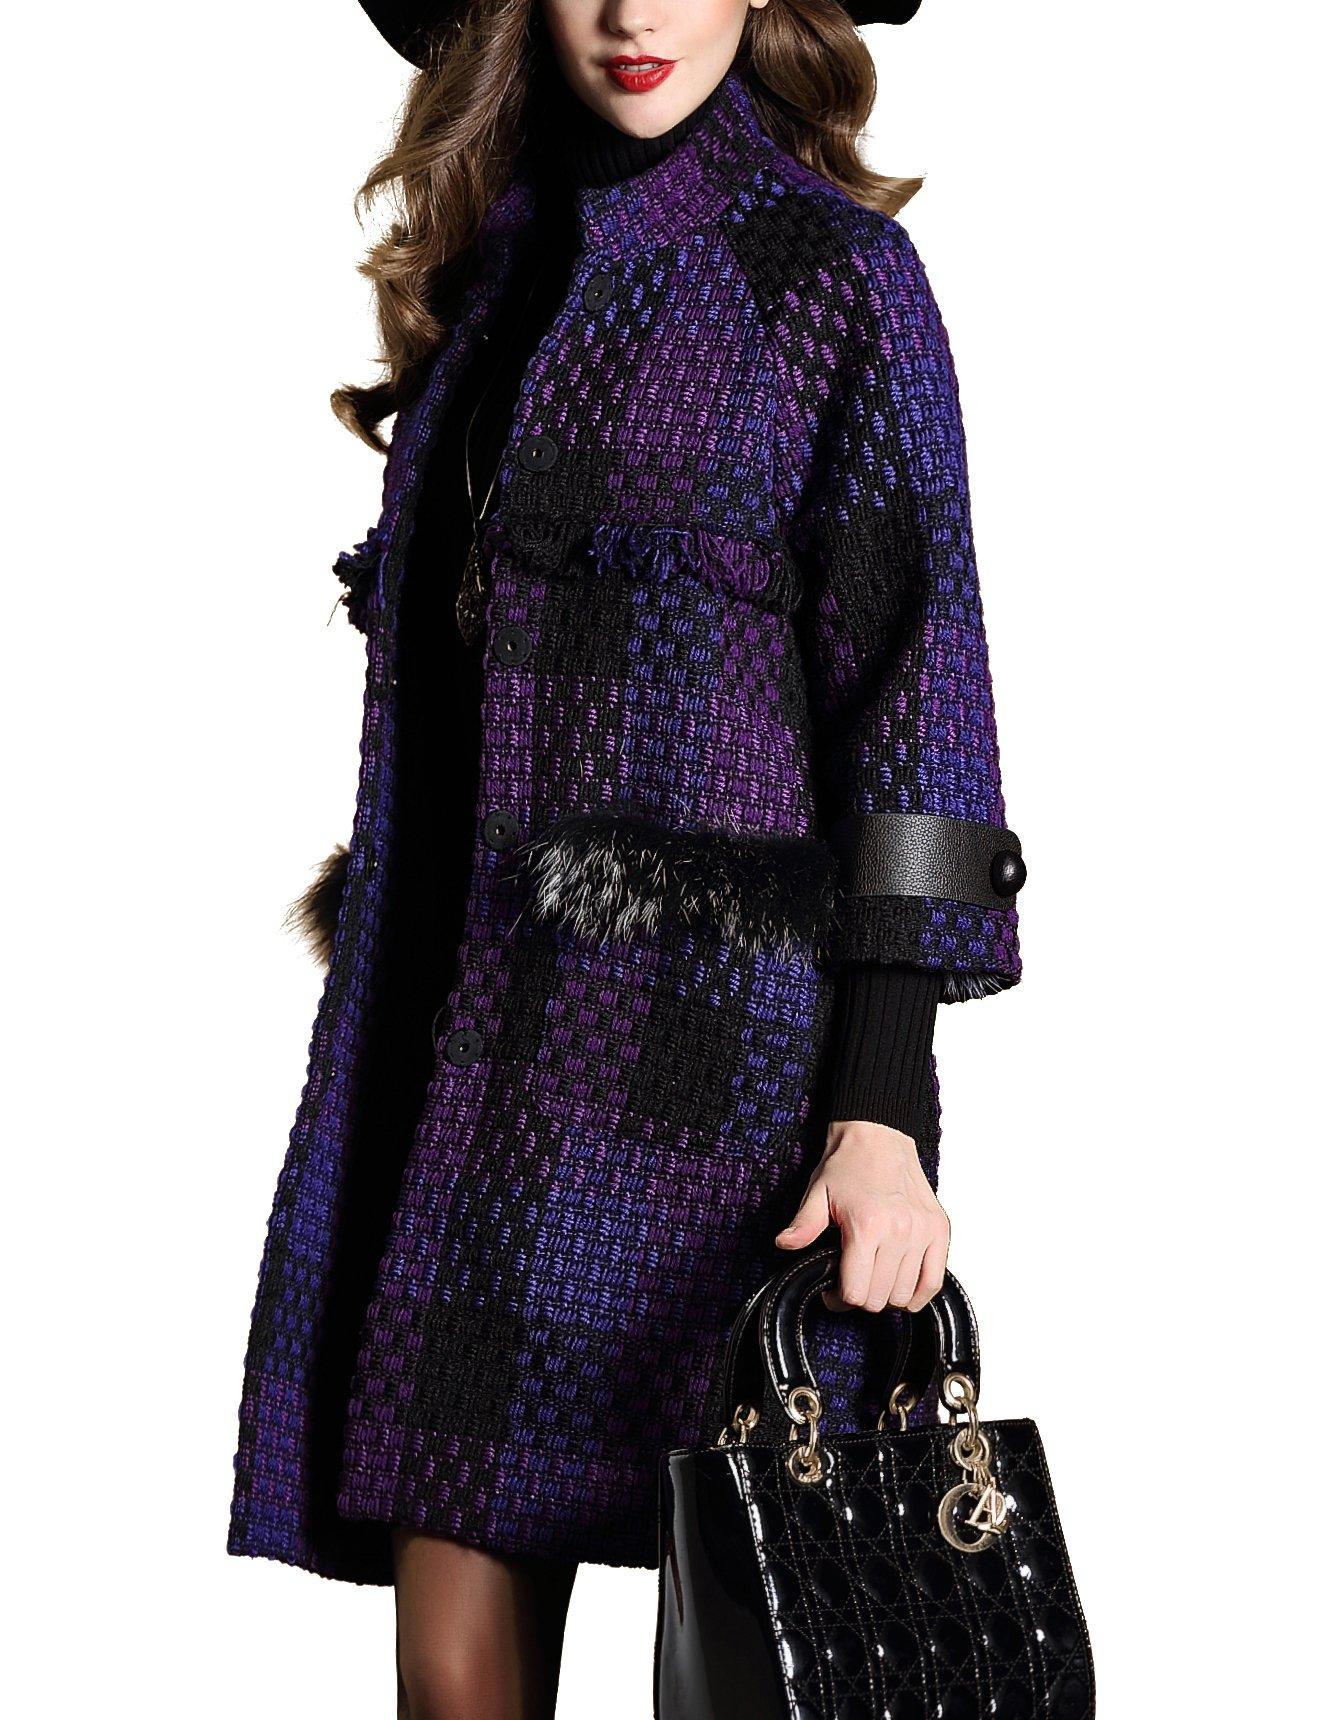 DanMunier Women's Winter Classic Double-Breasted Coat #4358 (M, Purple) by DanMunier (Image #2)